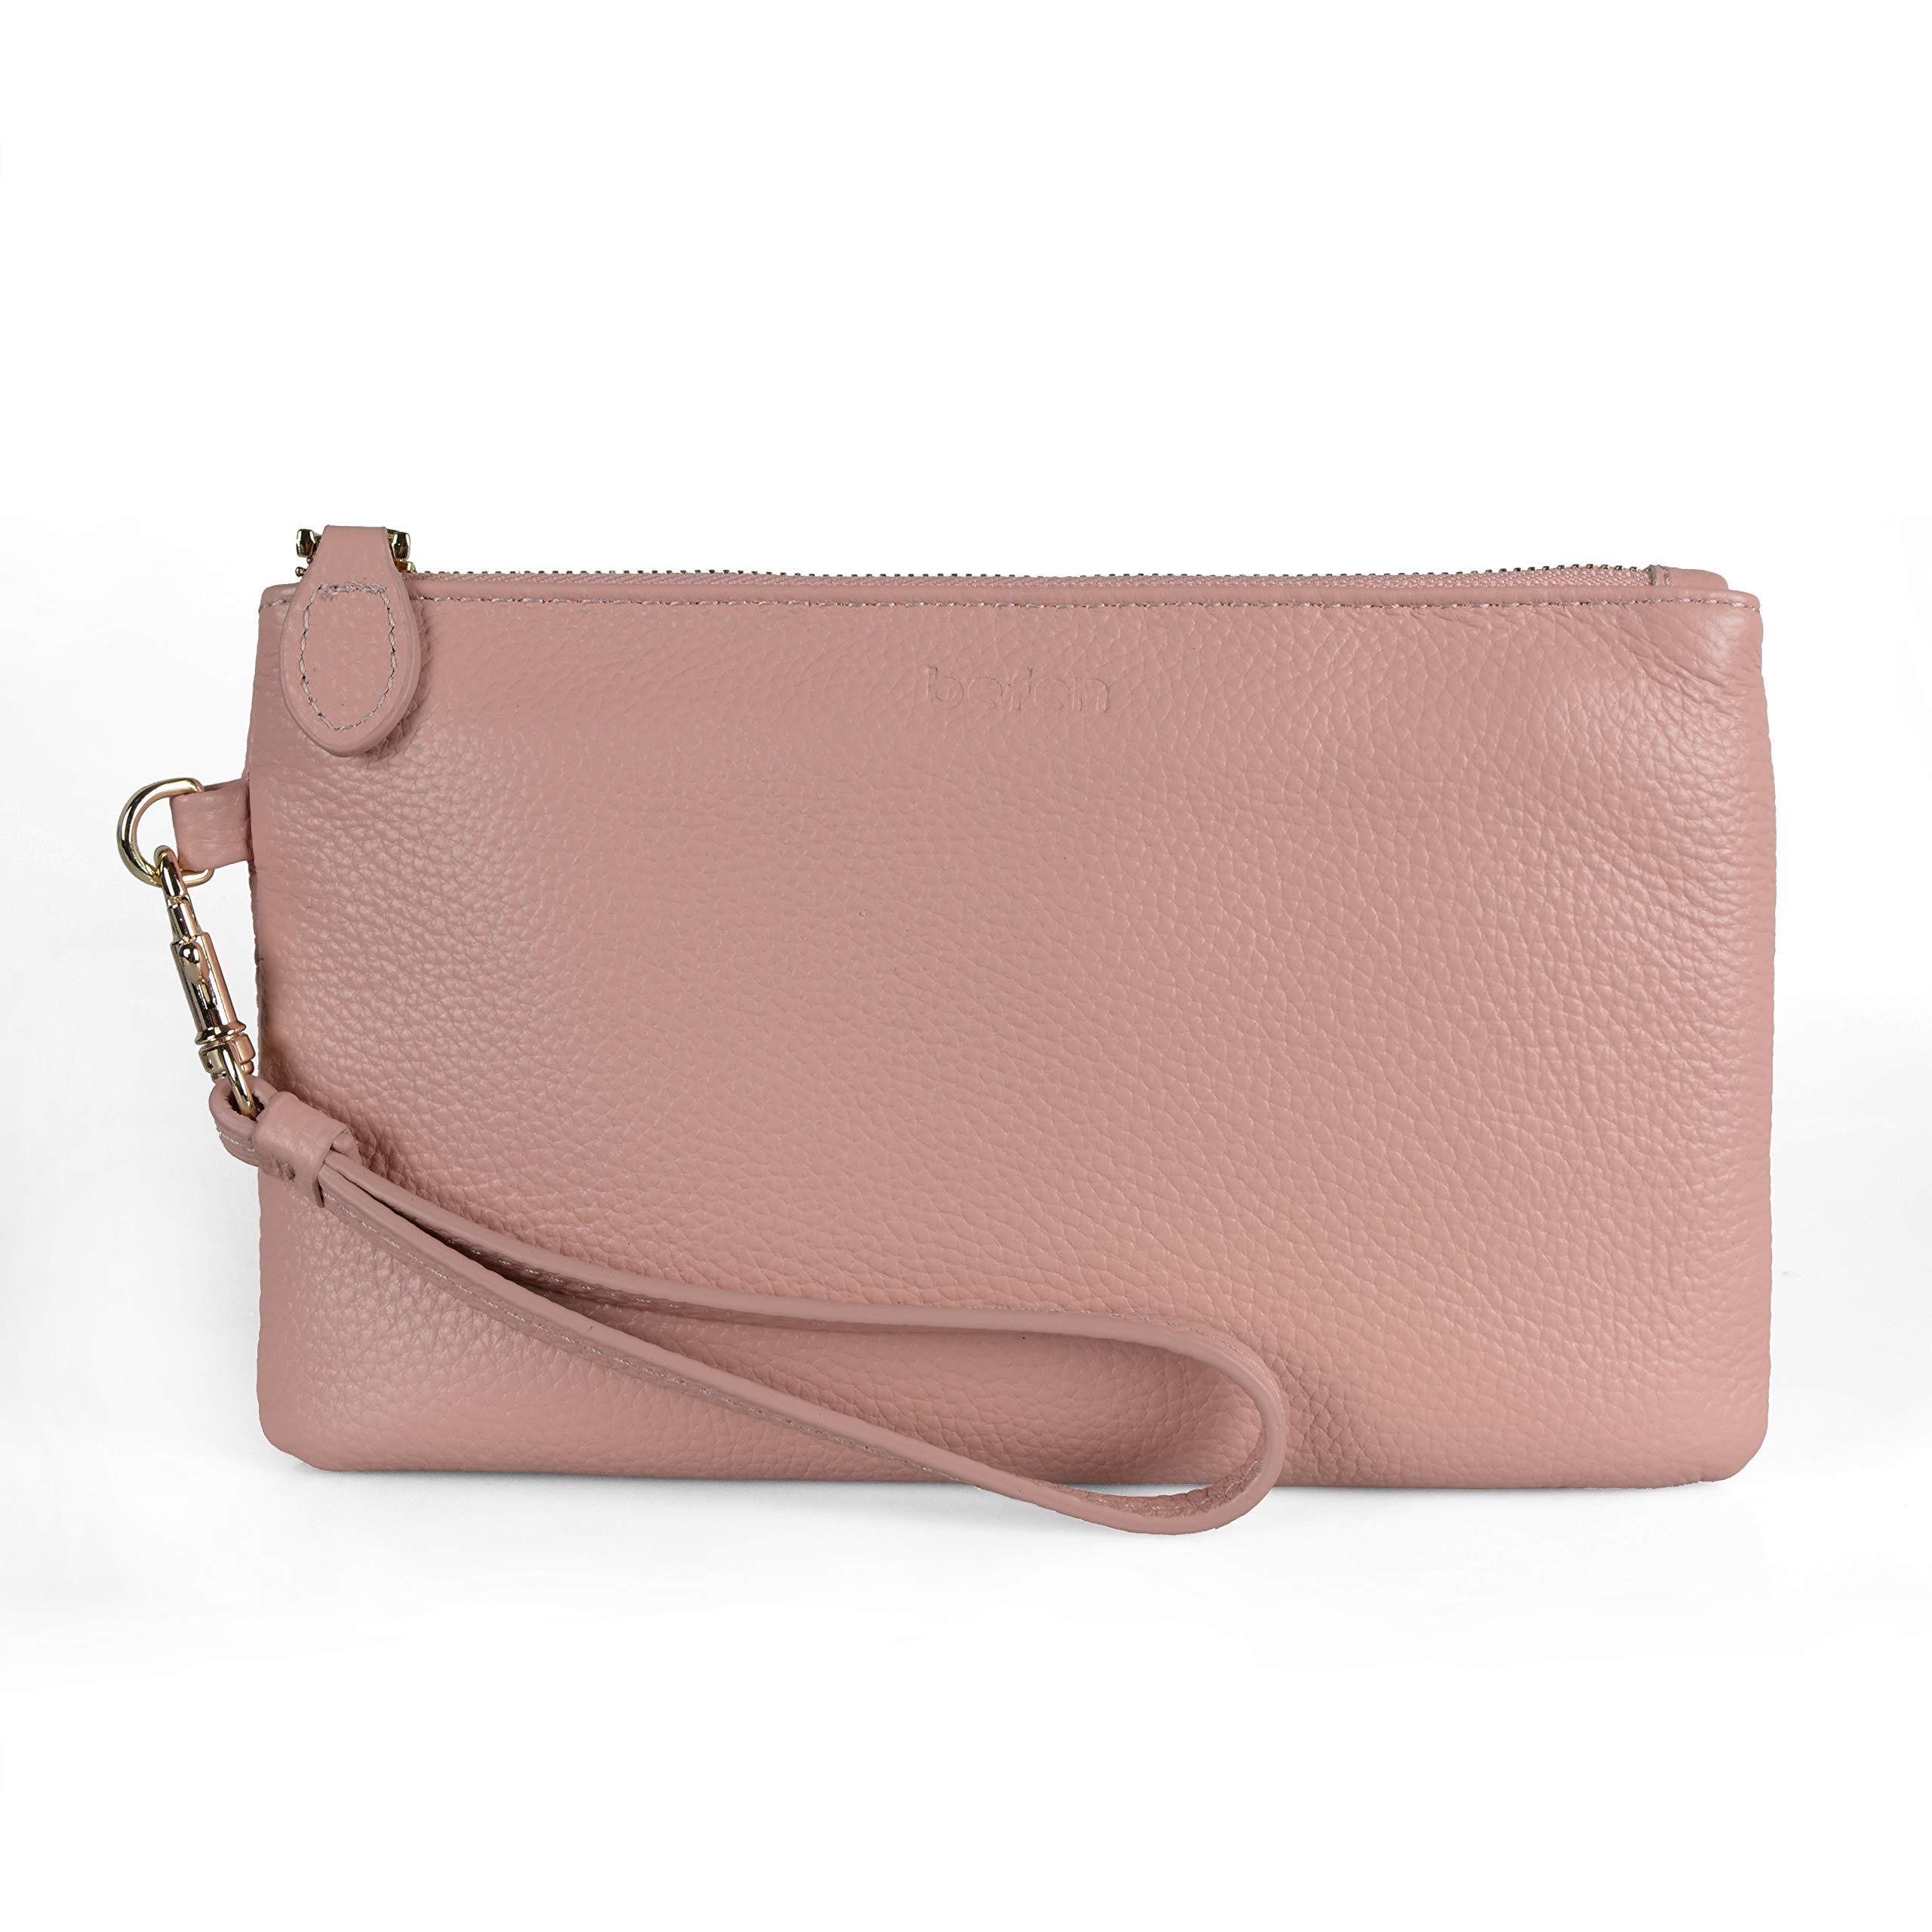 18cb6f528eae Best Rated in Women s Wristlet Handbags   Helpful Customer Reviews ...